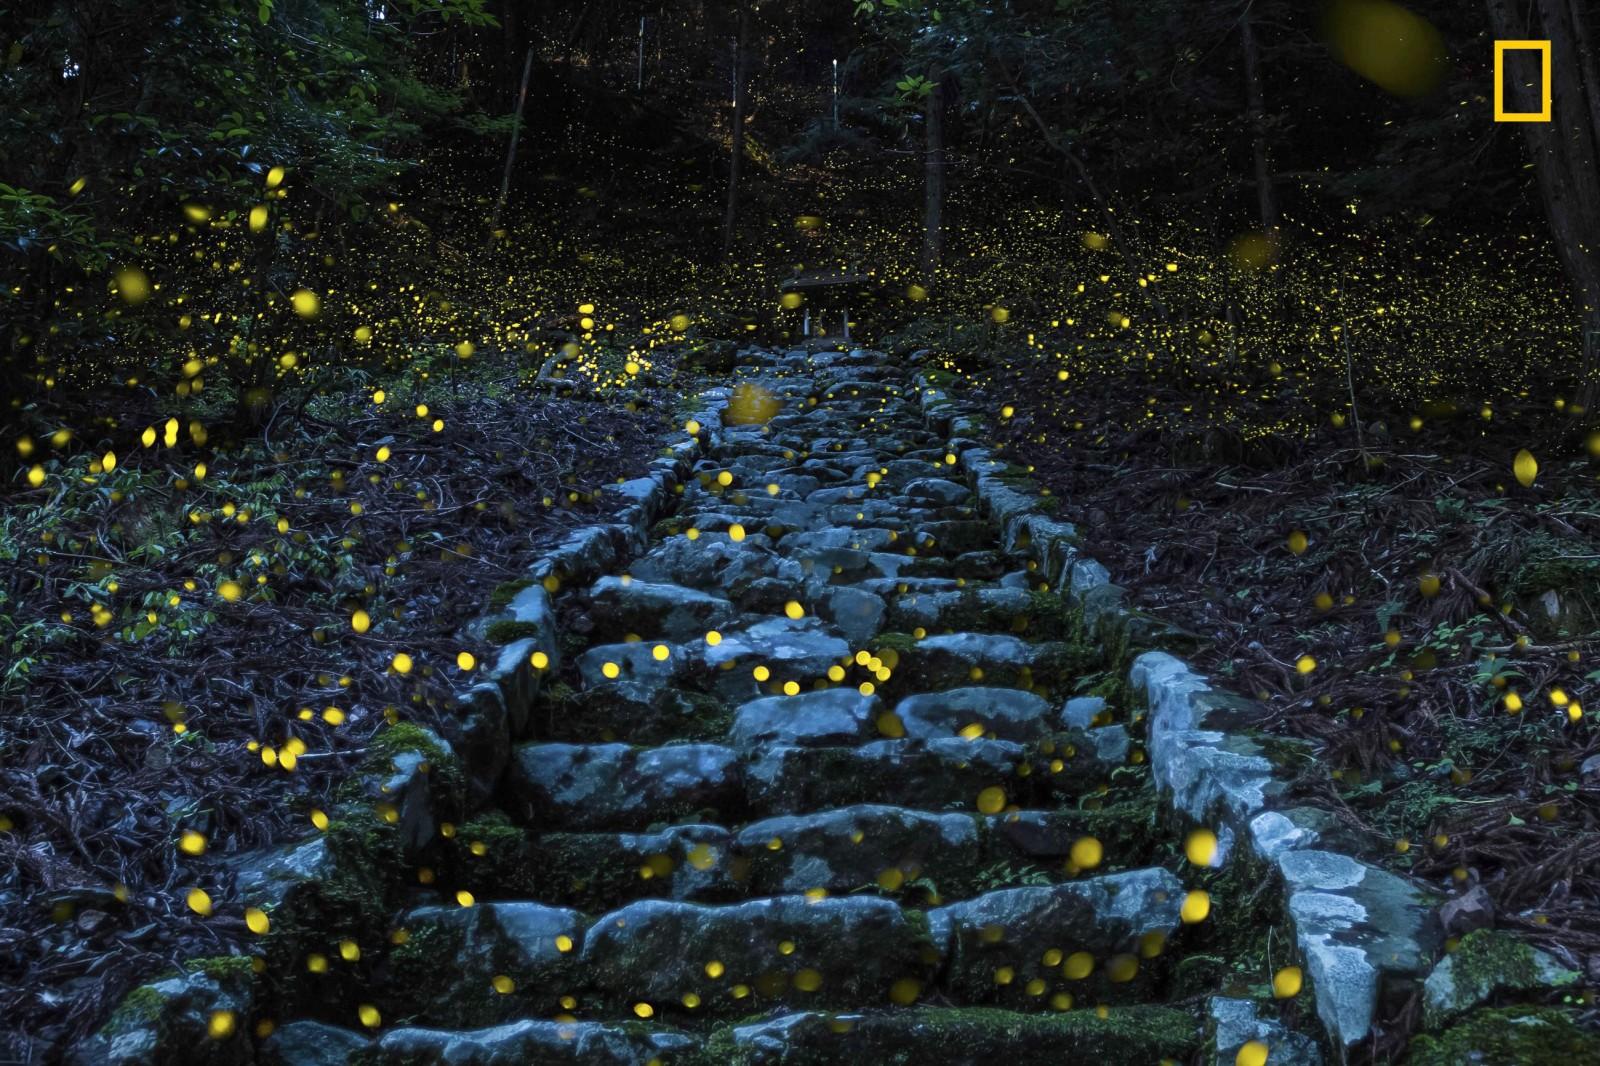 nature_lit_up2